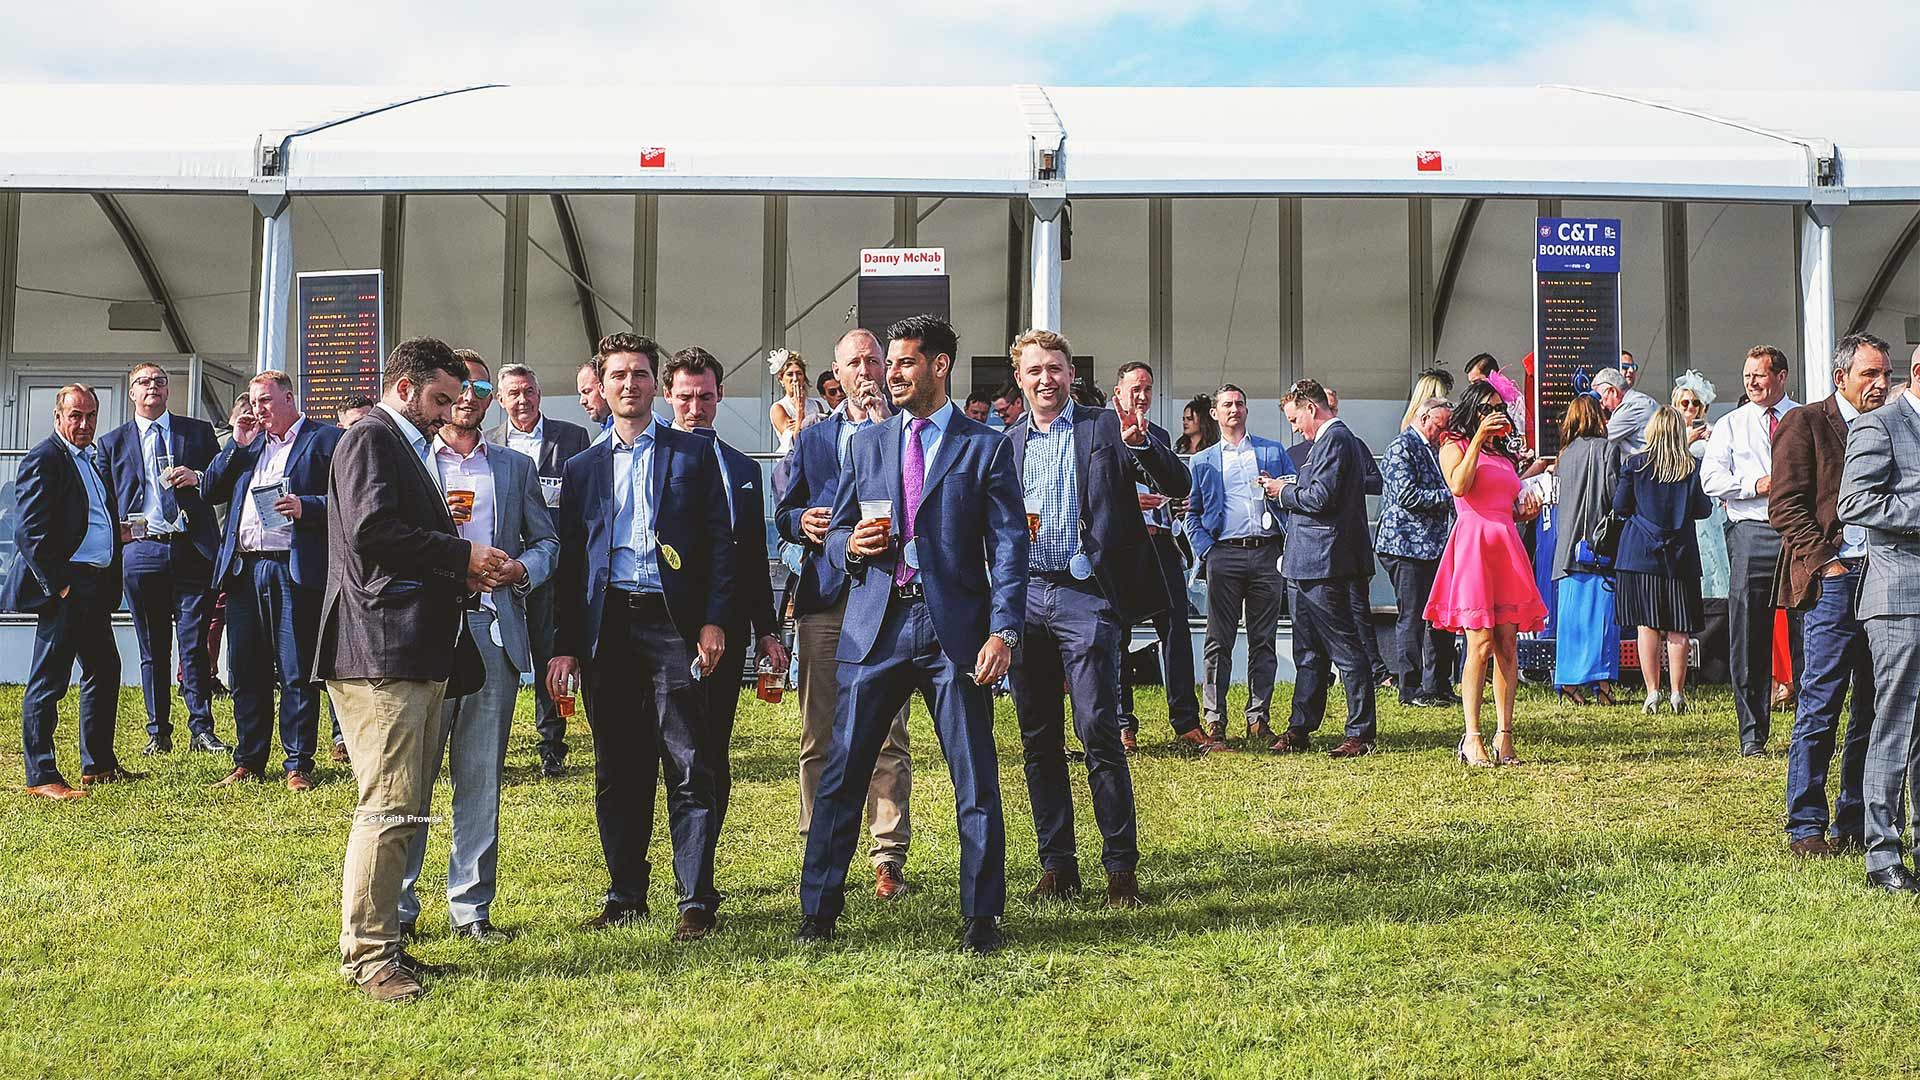 Derby Festival 2020.Investec Derby Festival Daimani